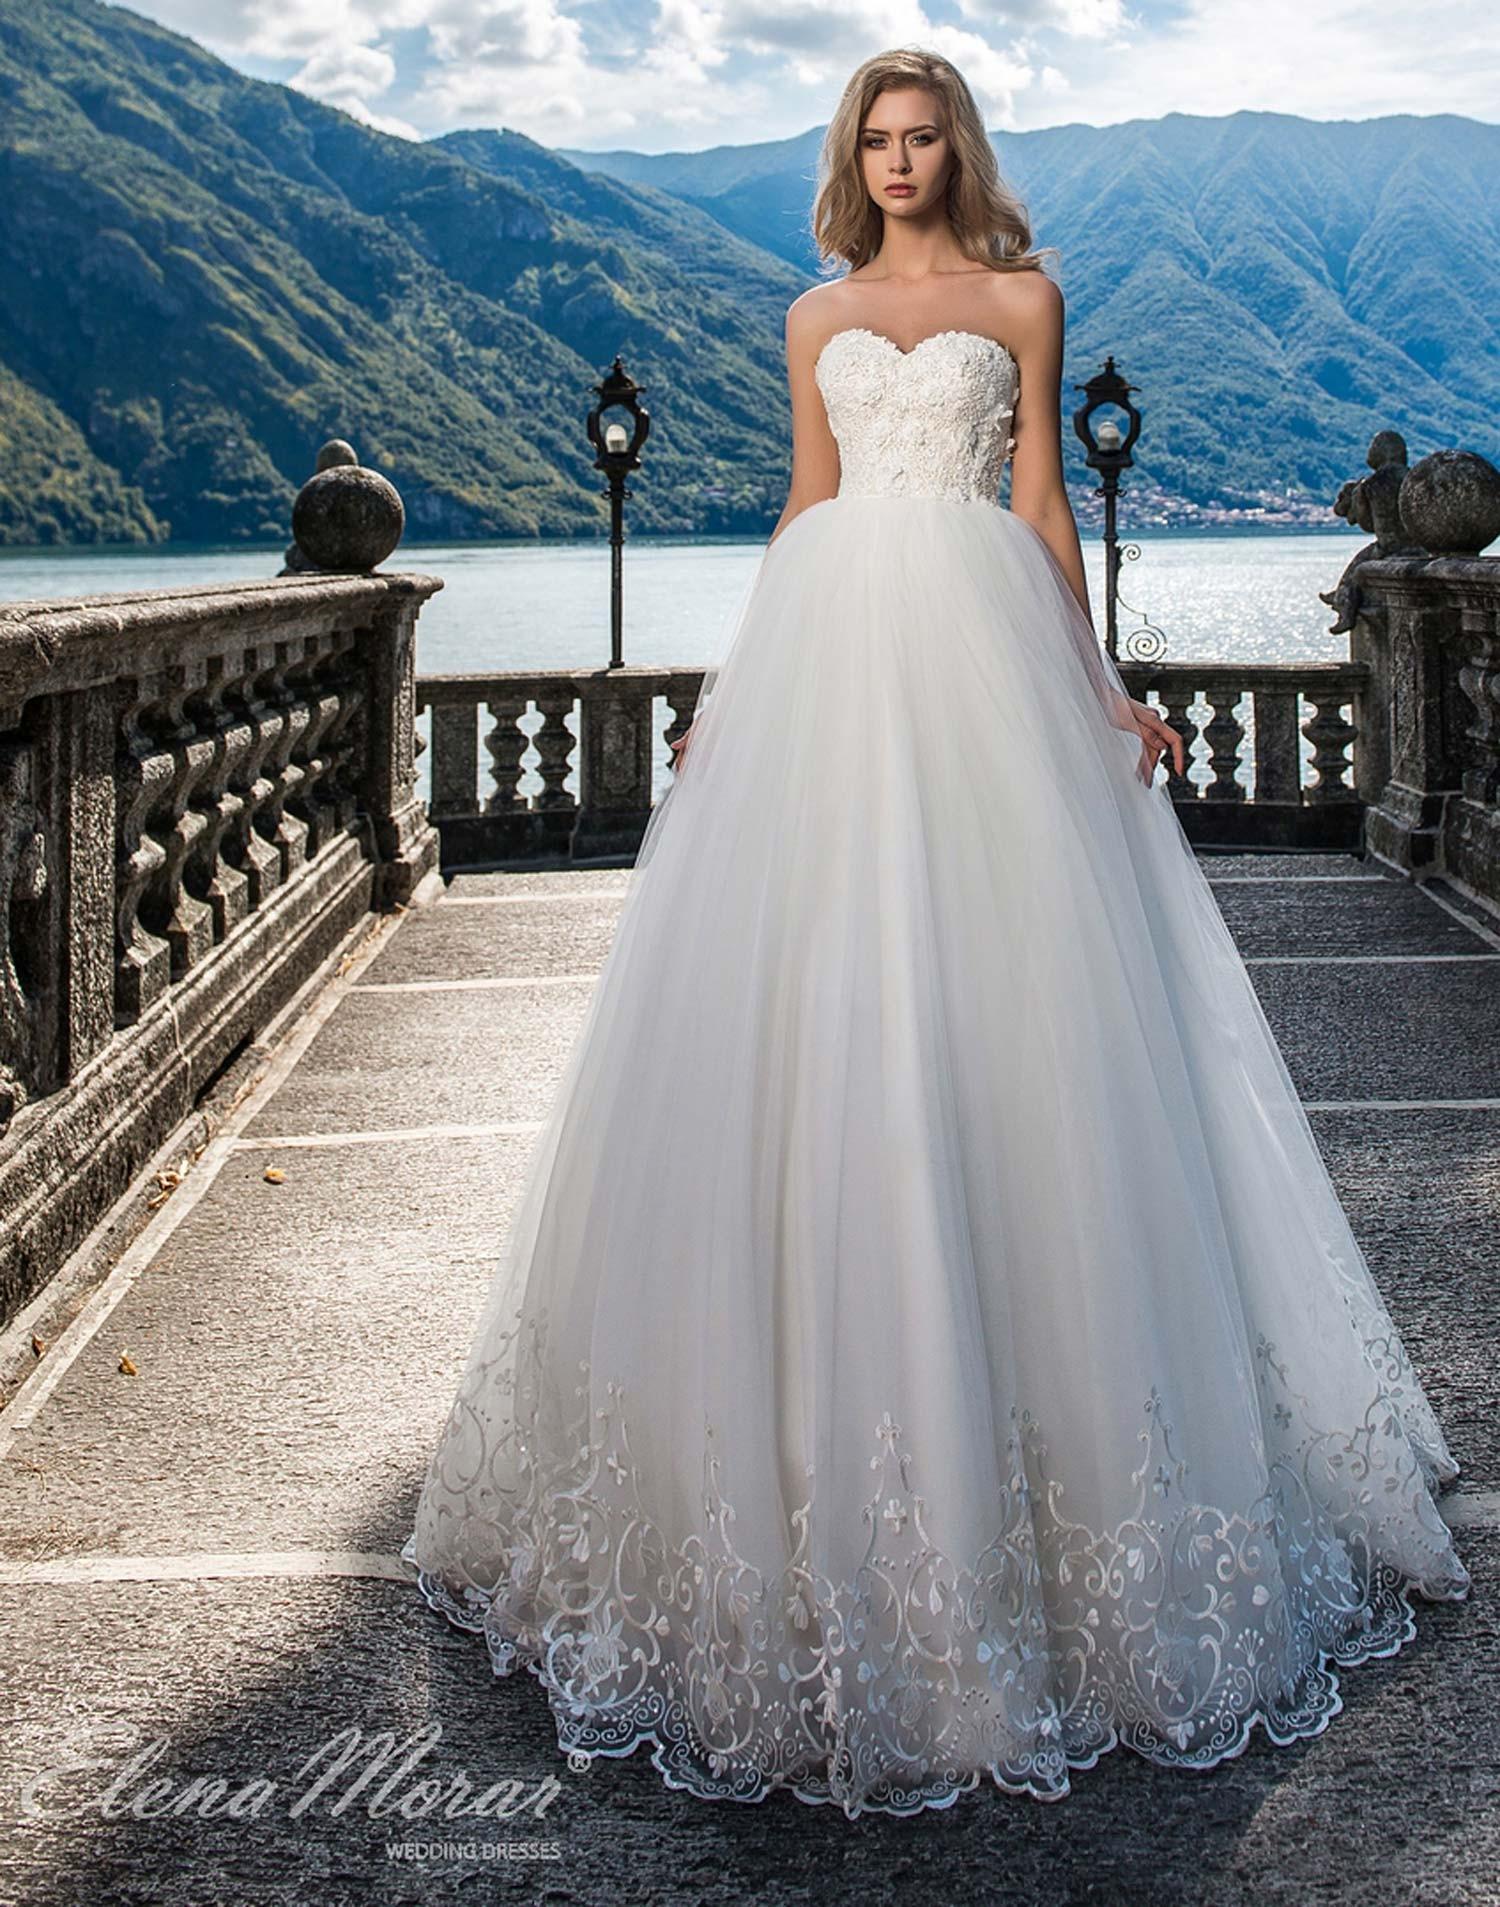 Robe de mariage princesse tulle et broderies